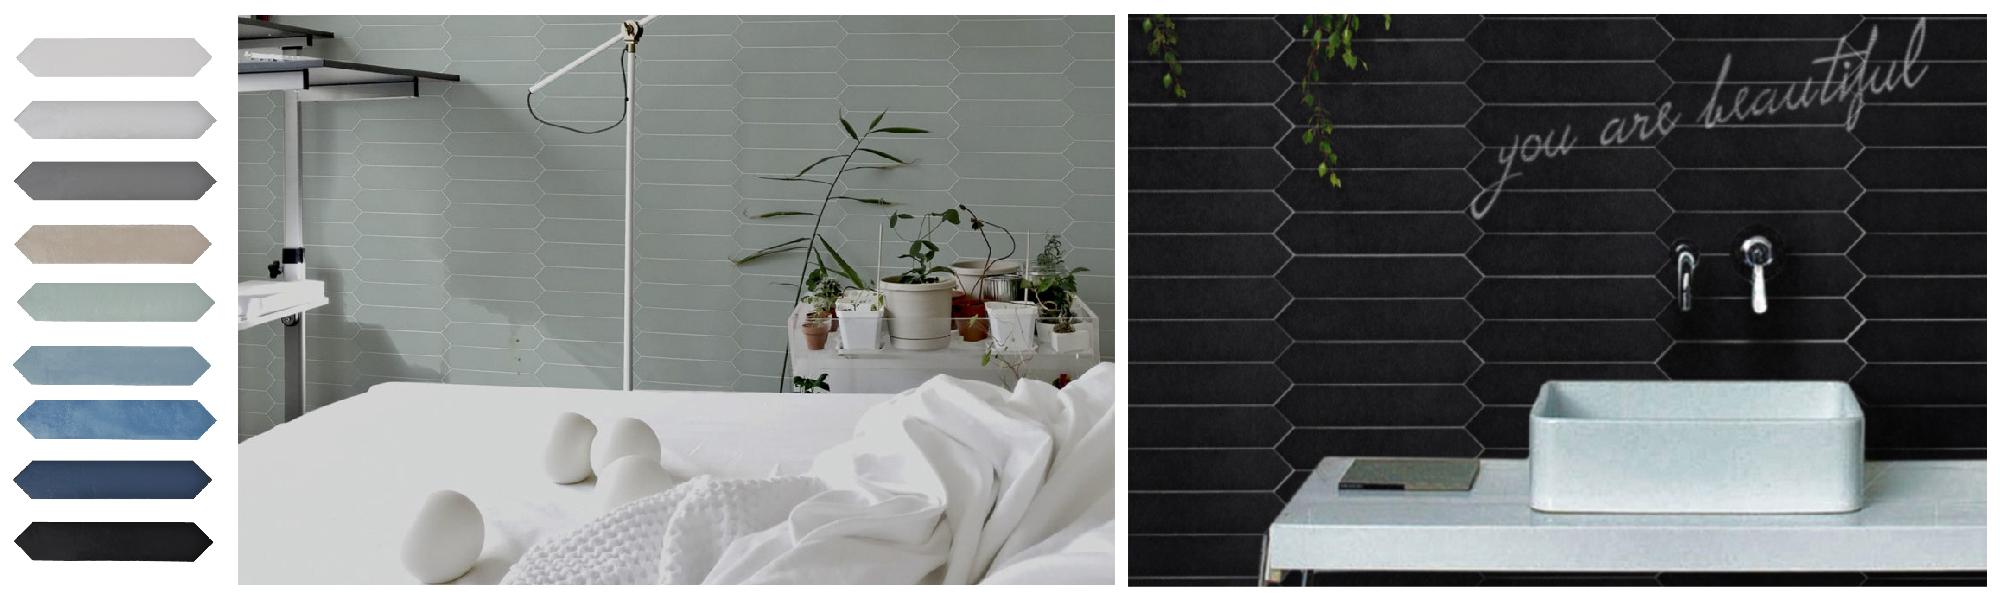 florentia-national-tile-day-mag-interior-design-01-01